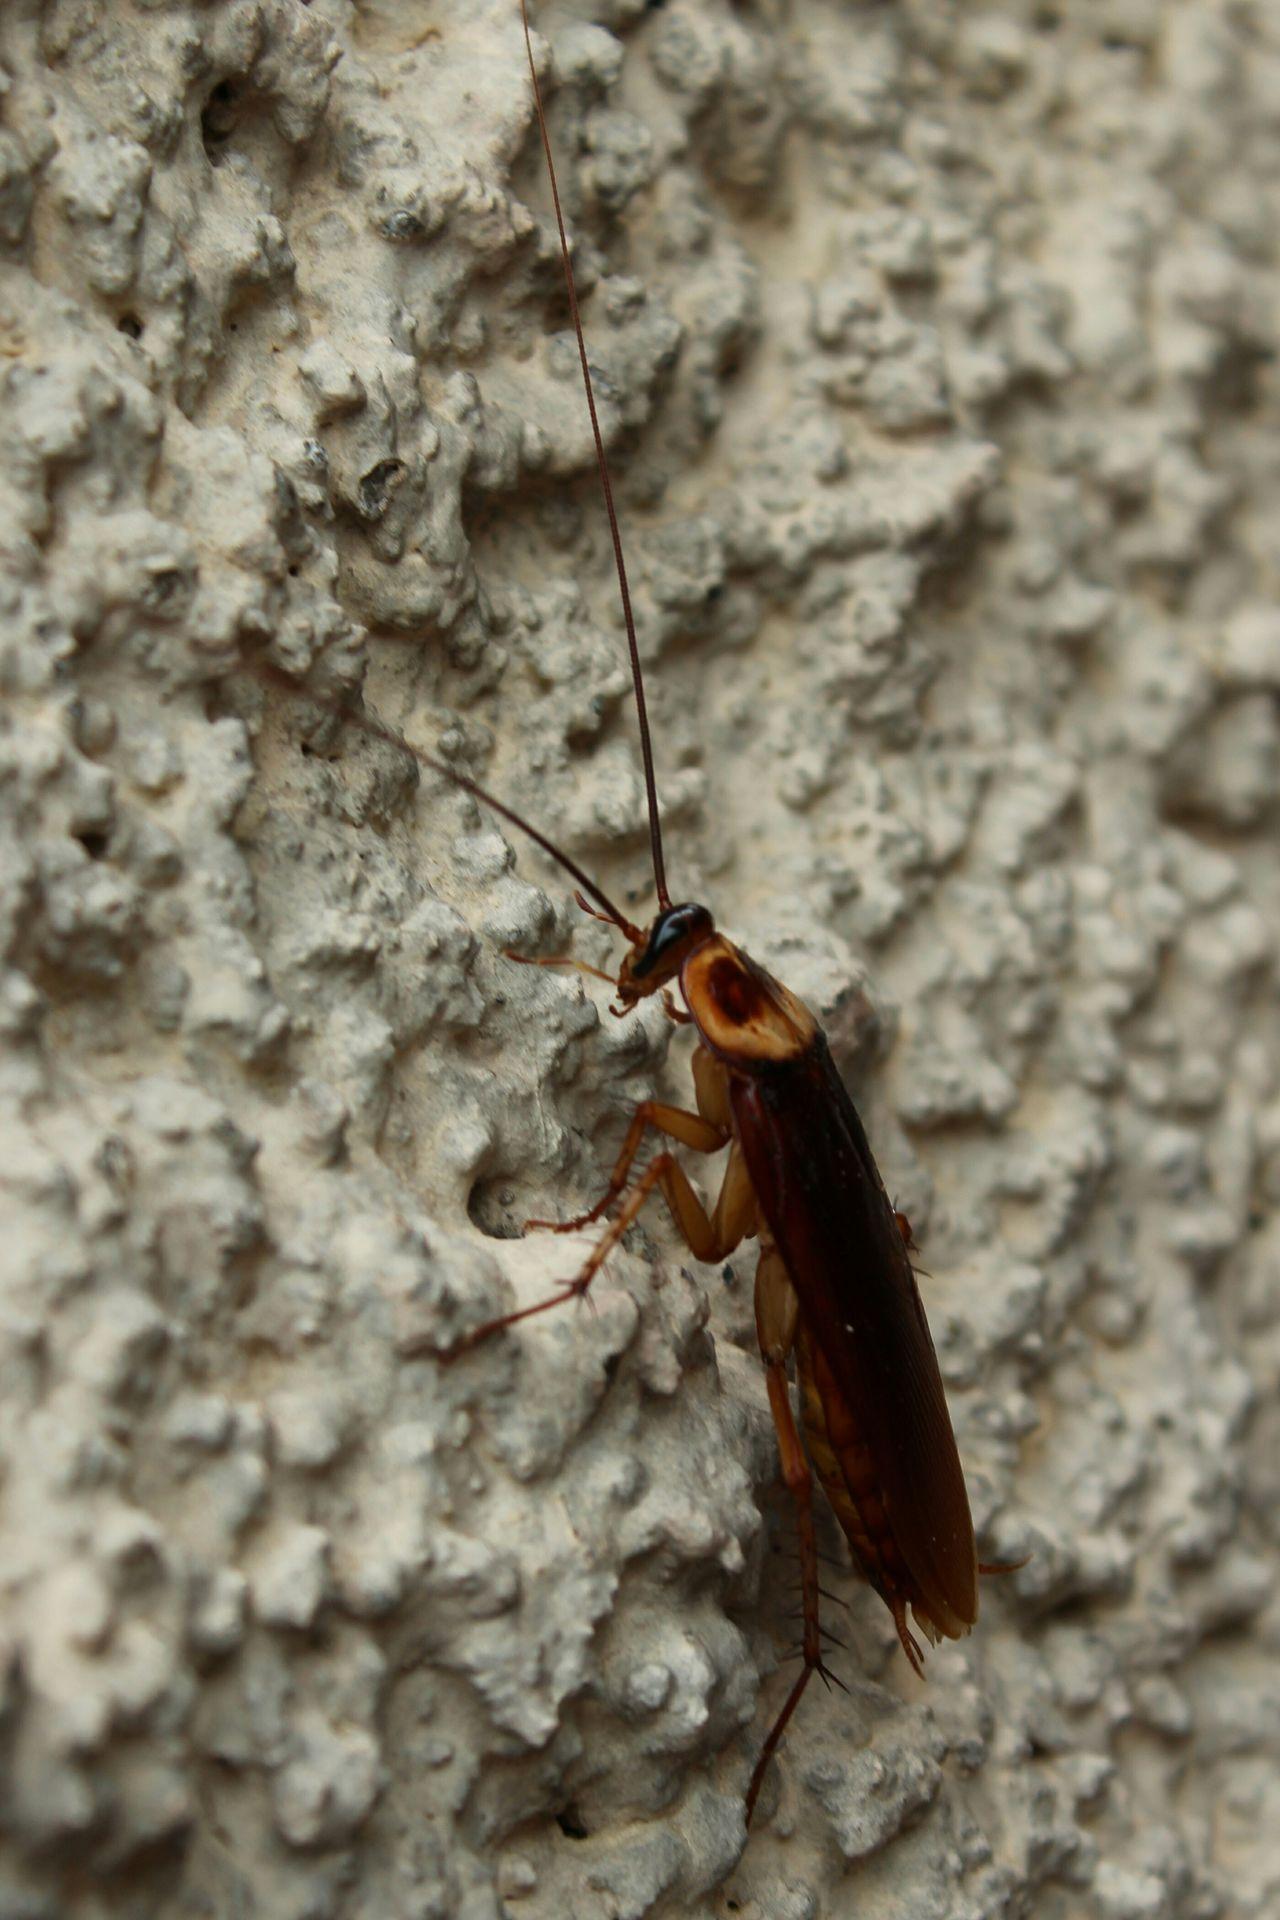 Barata Cockroach Cucaracha Insect Inseto Insect Paparazzi Nature Natureza